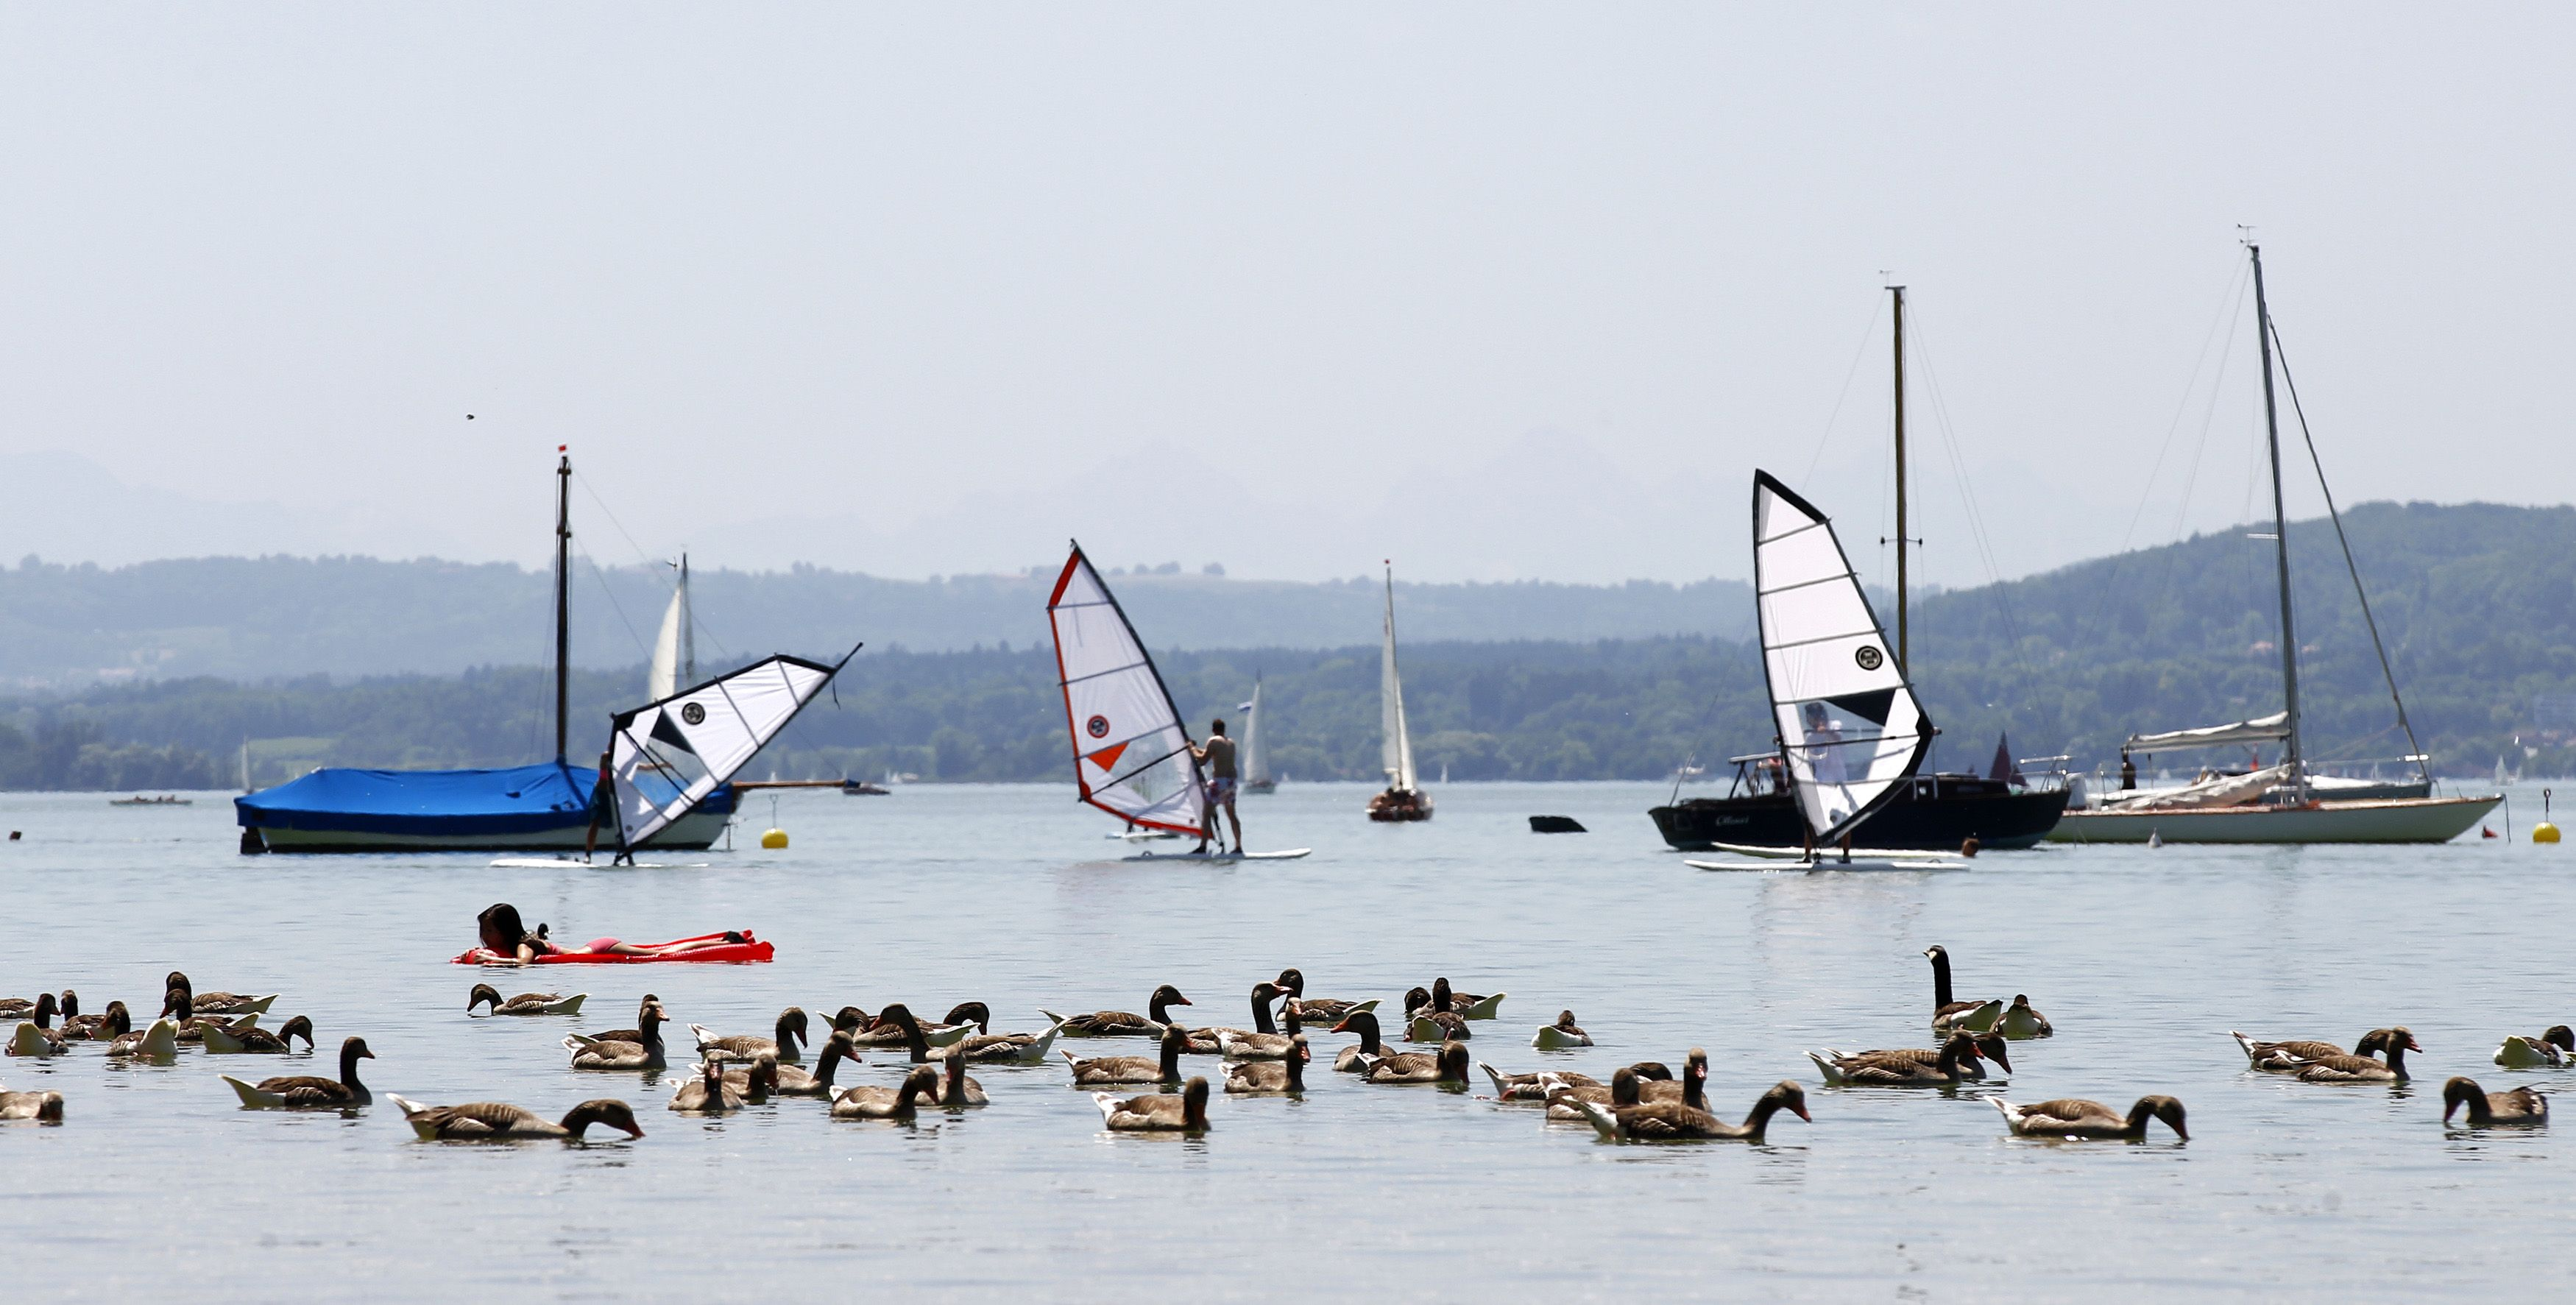 Suasana Di Danau Ammersee Di Kota Herrsching Jerman Beautiful